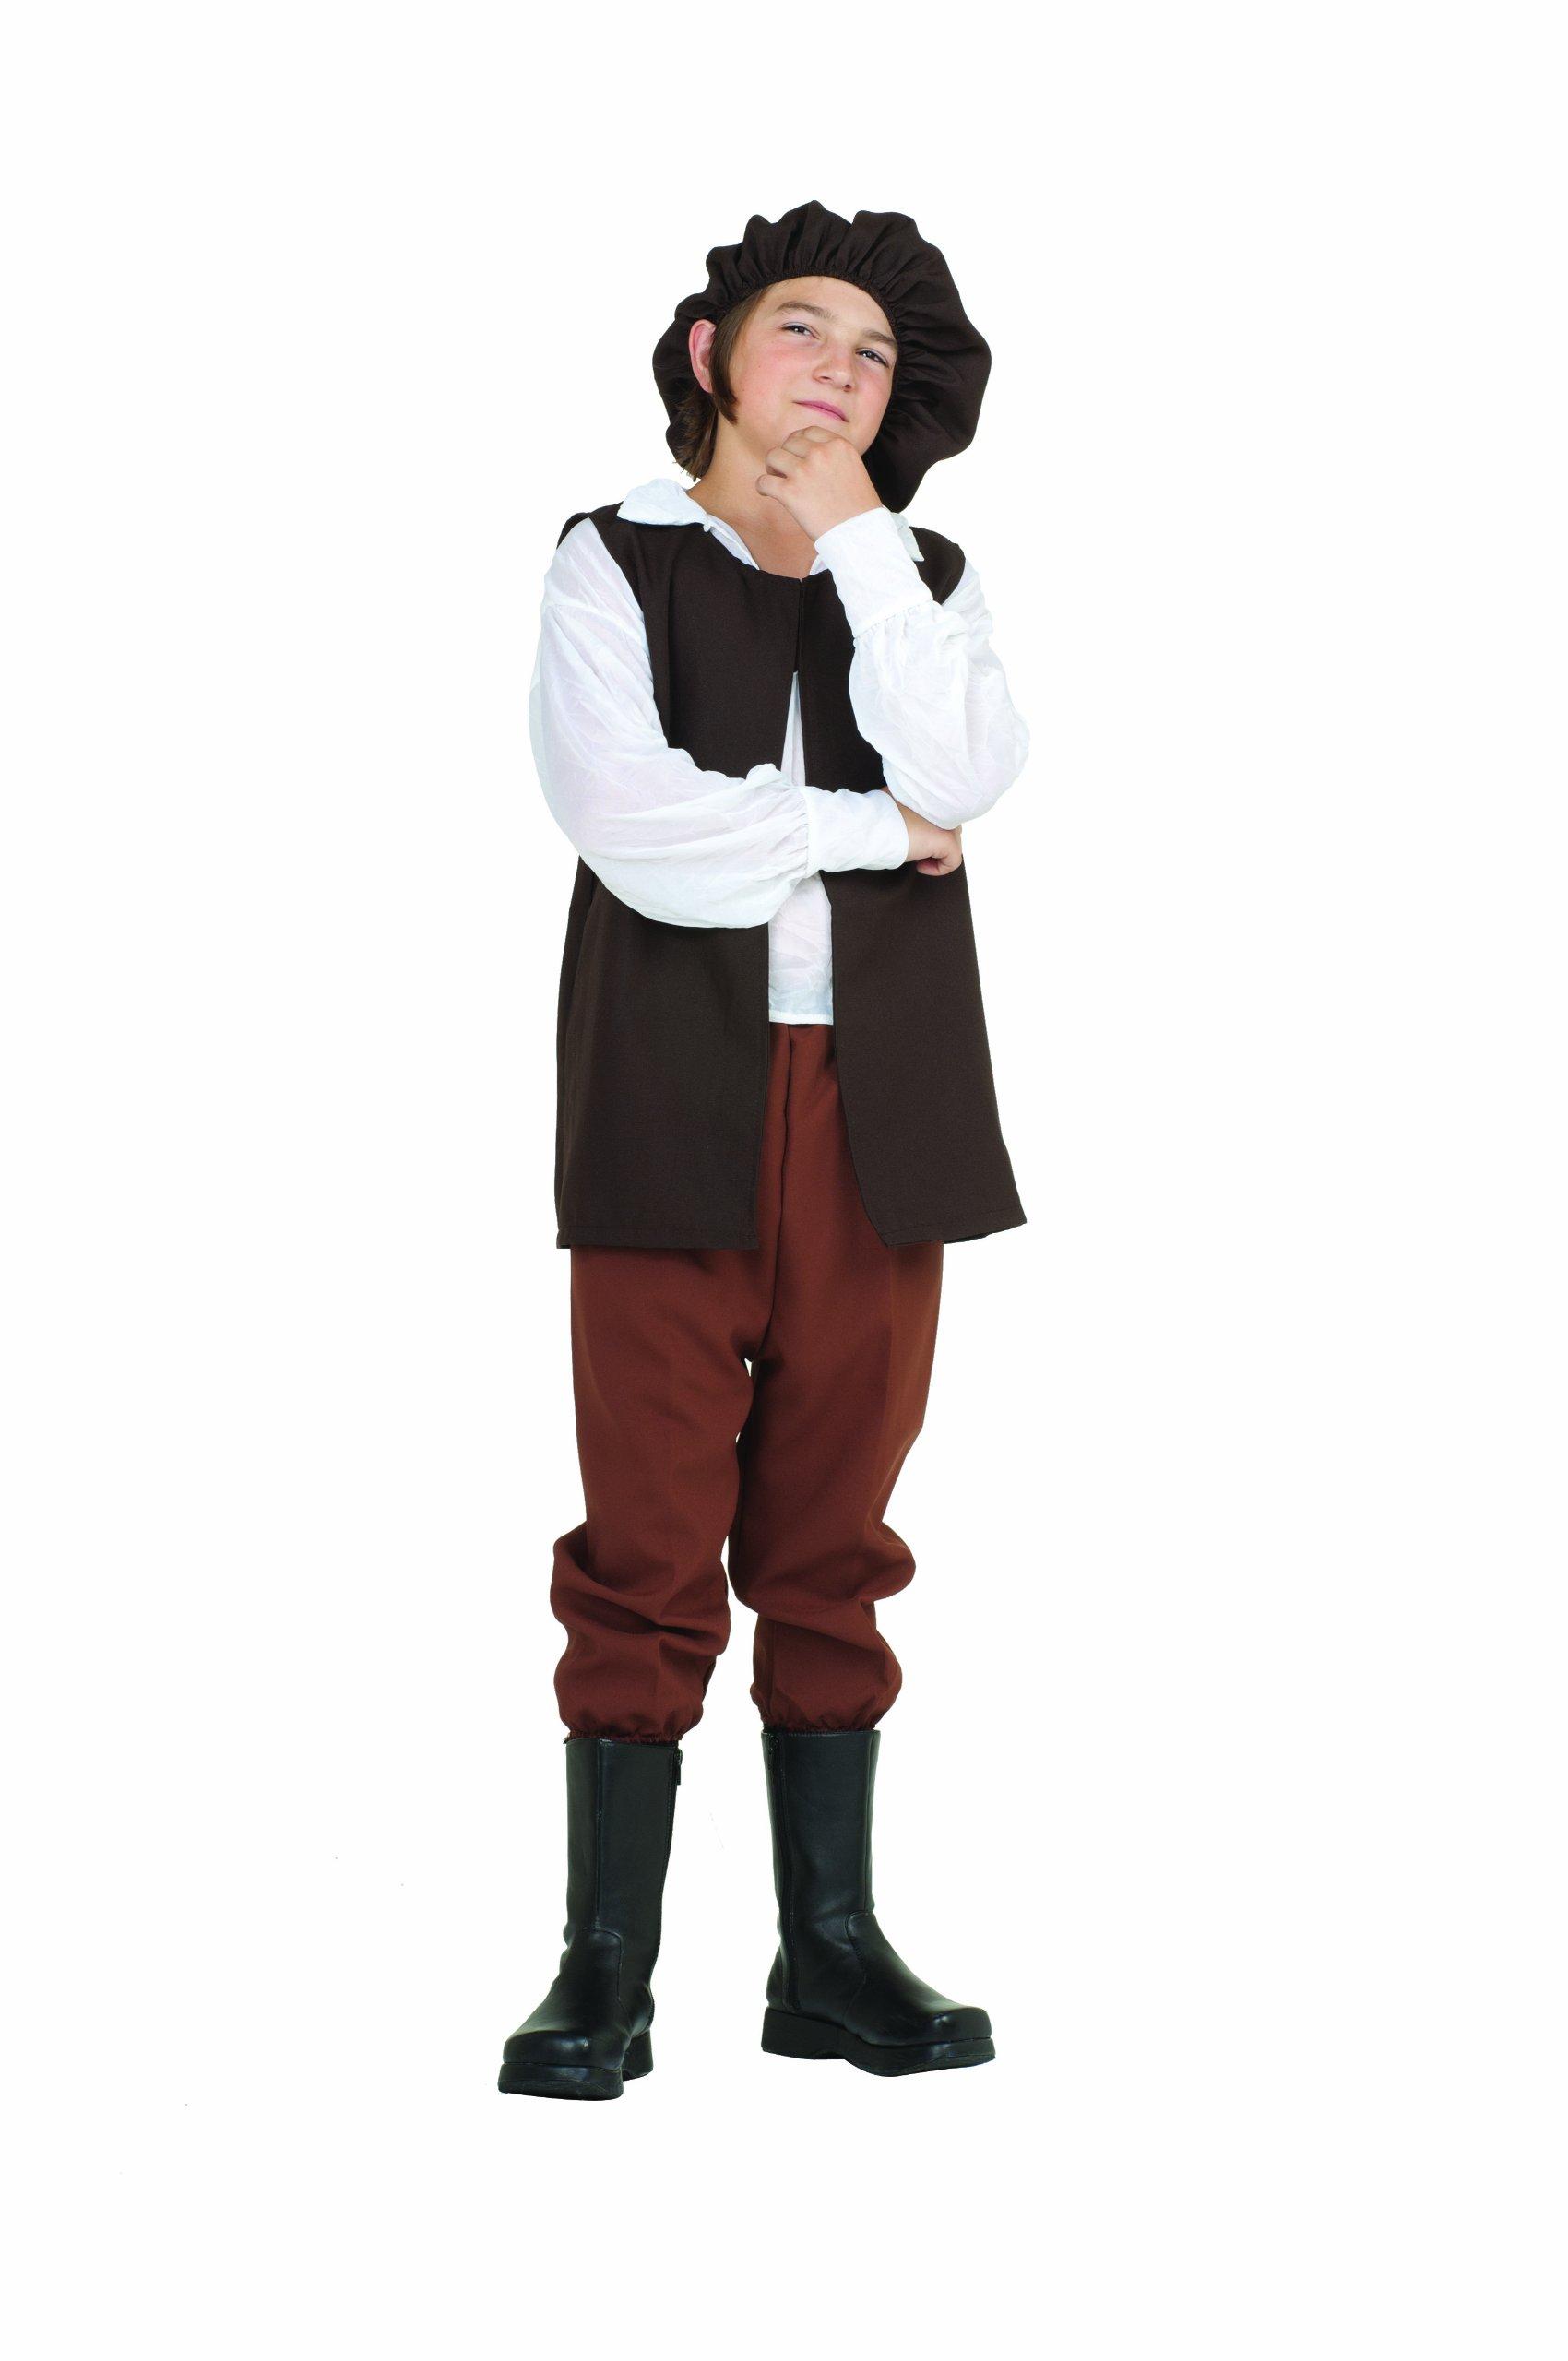 RG Costumes Renaissance Boy Costume, Brown/White, Large